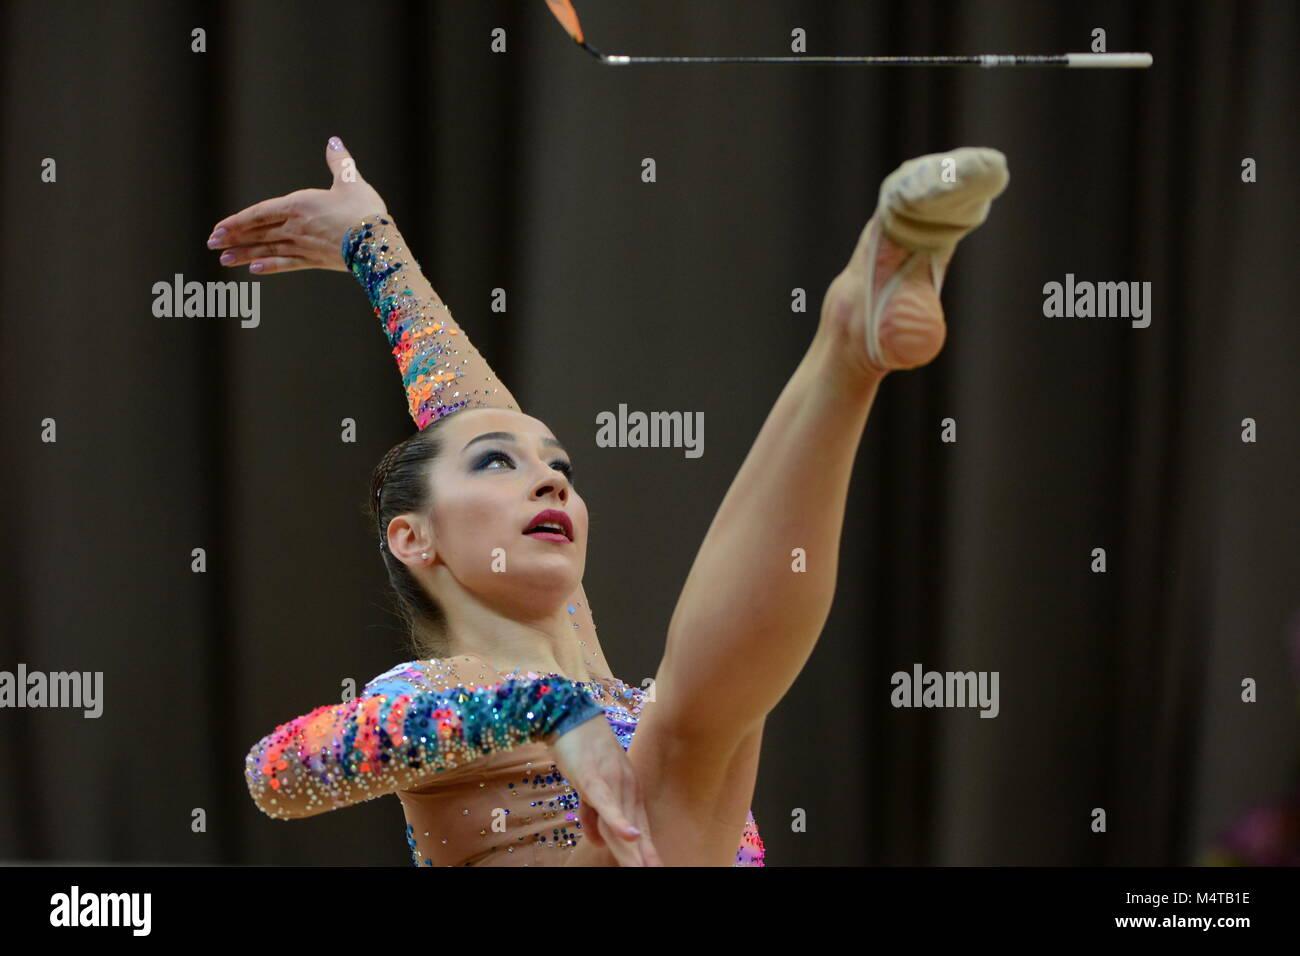 Moscow, Russia. 17th Feb, 2018. MOSCOW, RUSSIA - FEBRUARY 17, 2018: Rhythmic gymnast Katsiaryna Halkina of Belarus - Stock Image